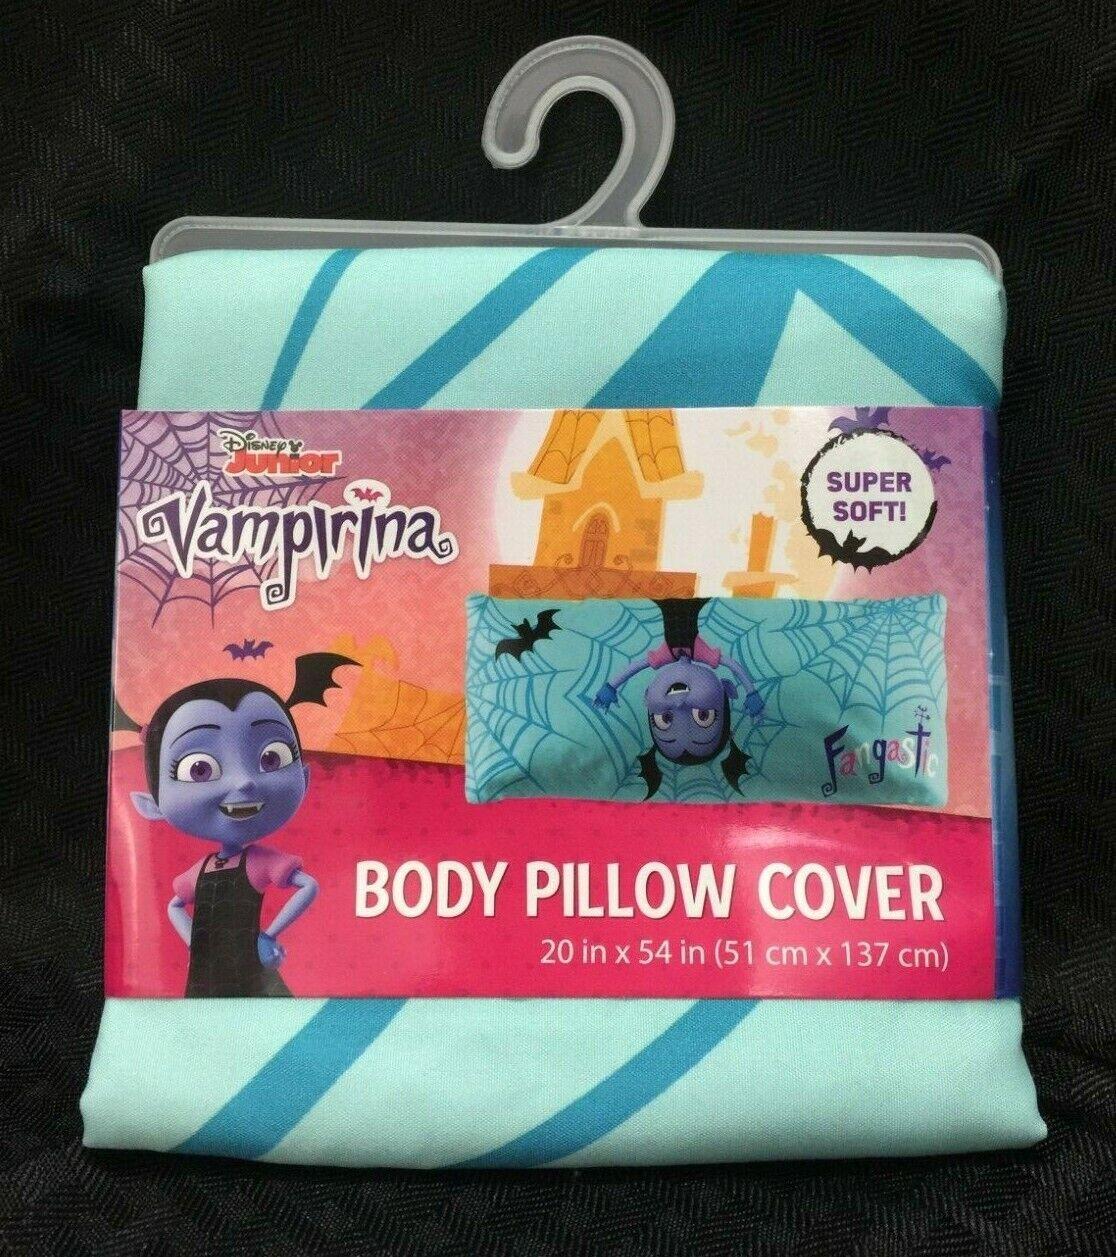 "Vampirina Disney Junior Body Pillow Cover 20"" x 54"" Fangasti"